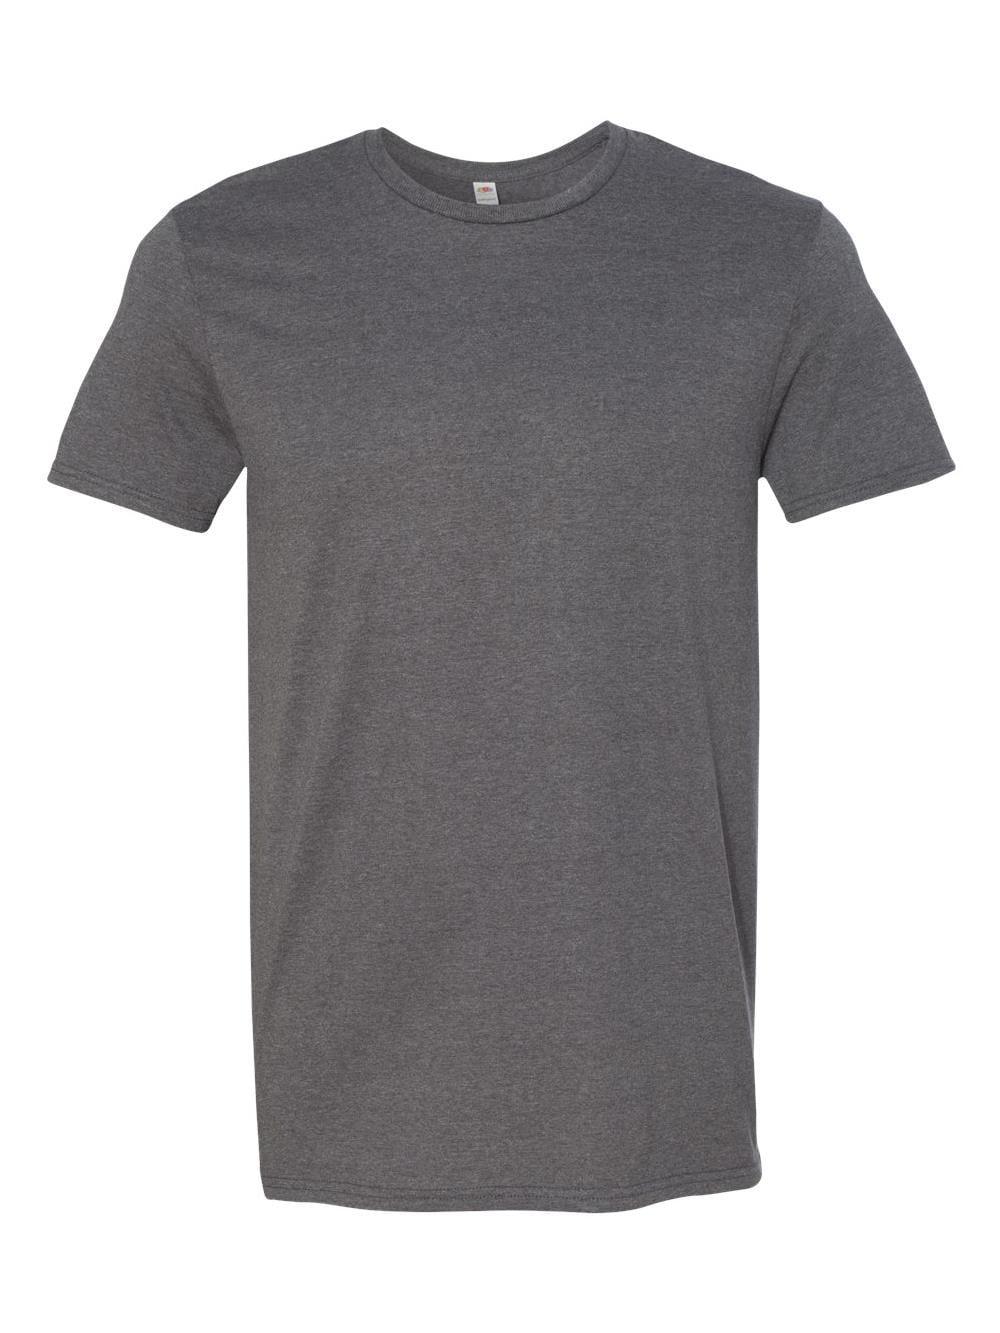 SF45R Fruit of the Loom Sofspun Crewneck T-Shirt